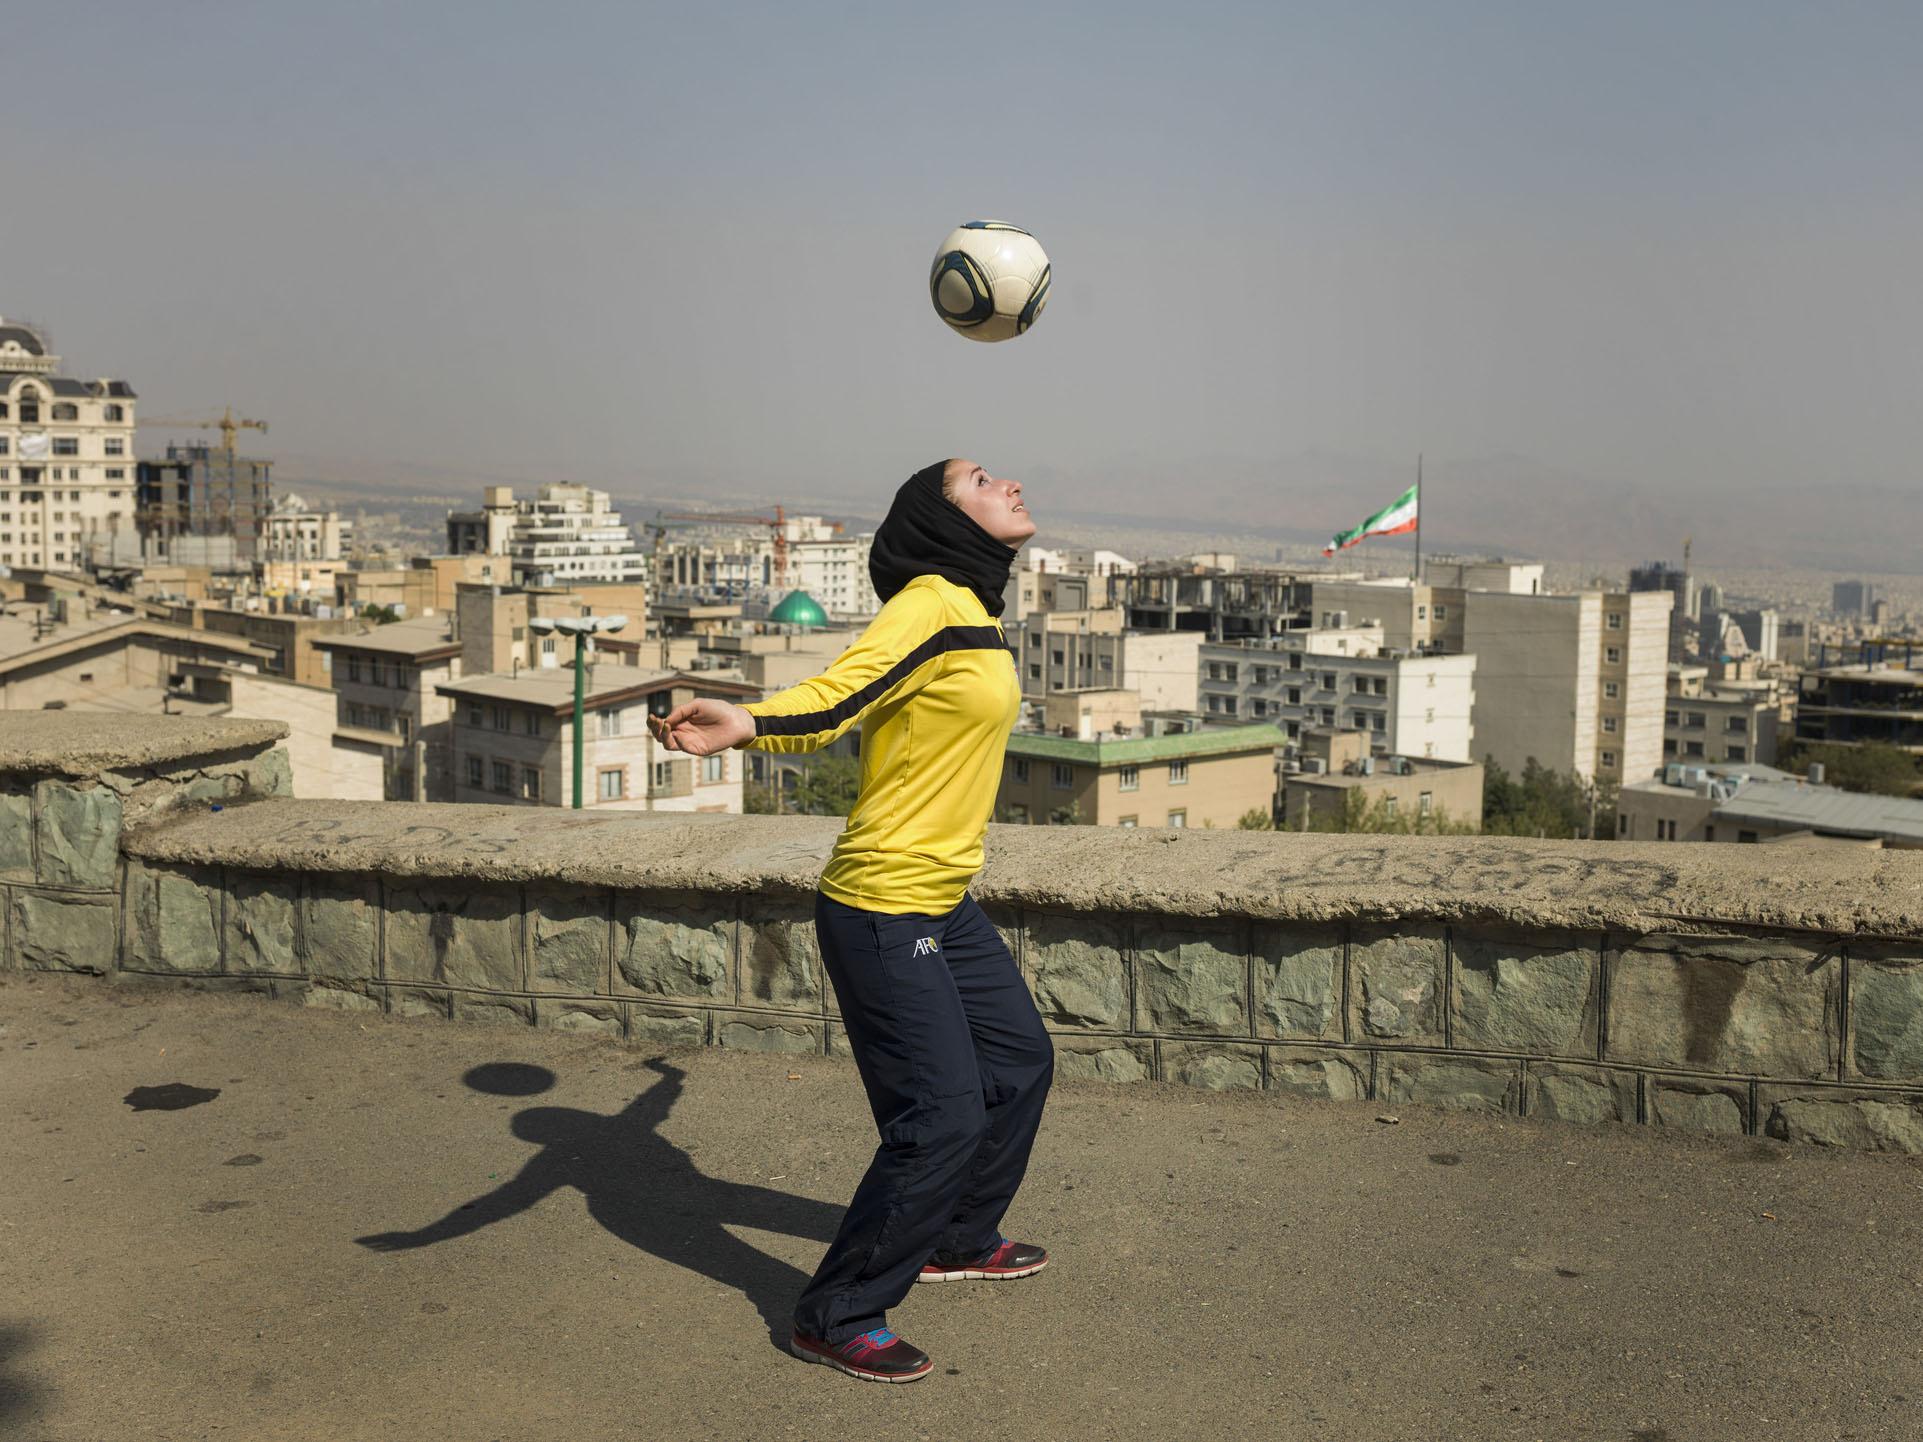 WOMEN'S FOOTBALL IN IRAN